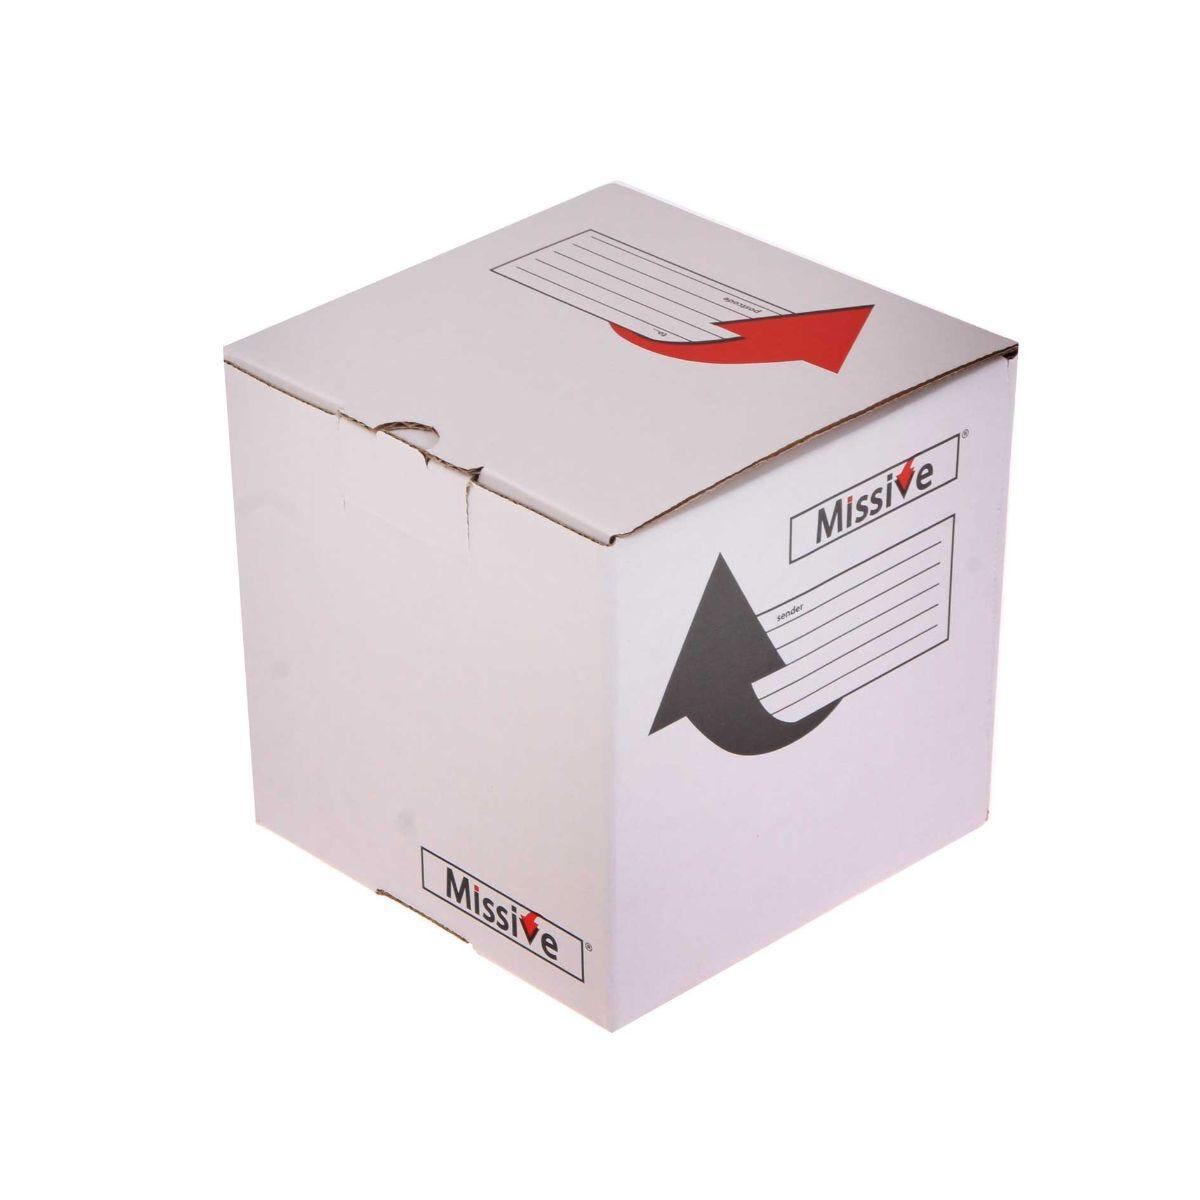 Missive Value Postal Box Small Cube 160x160x160mm Pack of 20